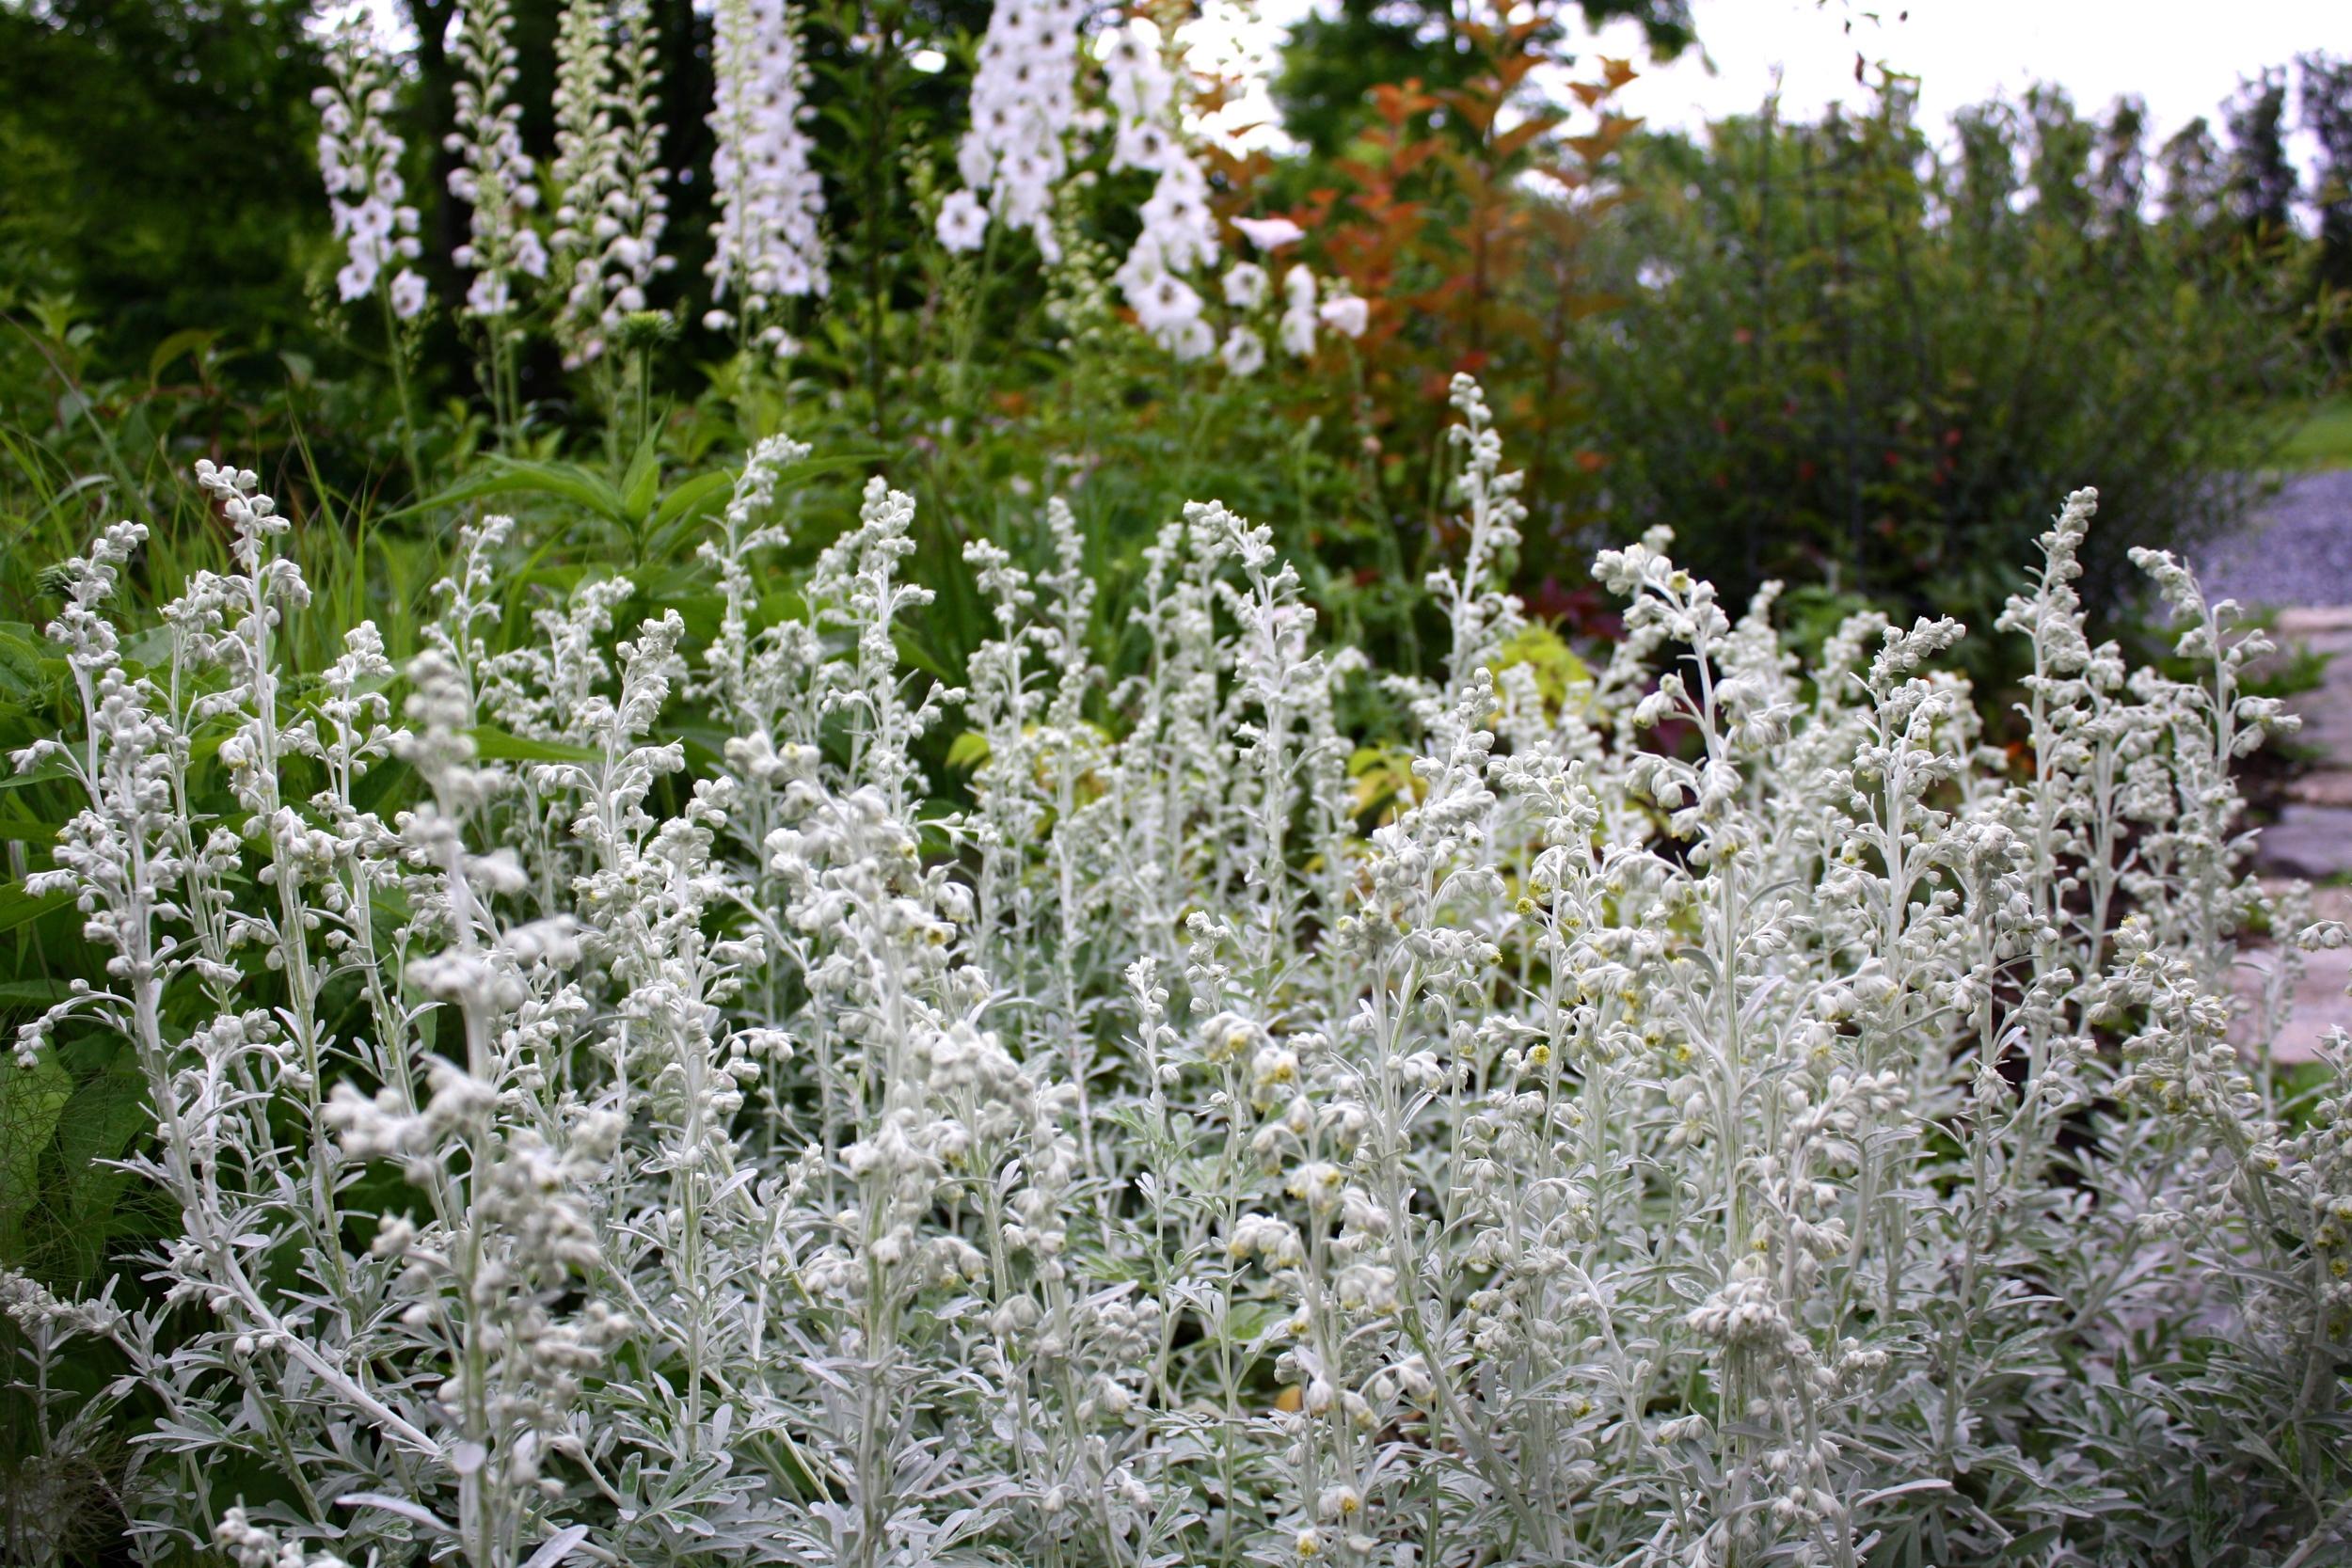 Artemisia stelleriana 'Silver Brocade' blooming